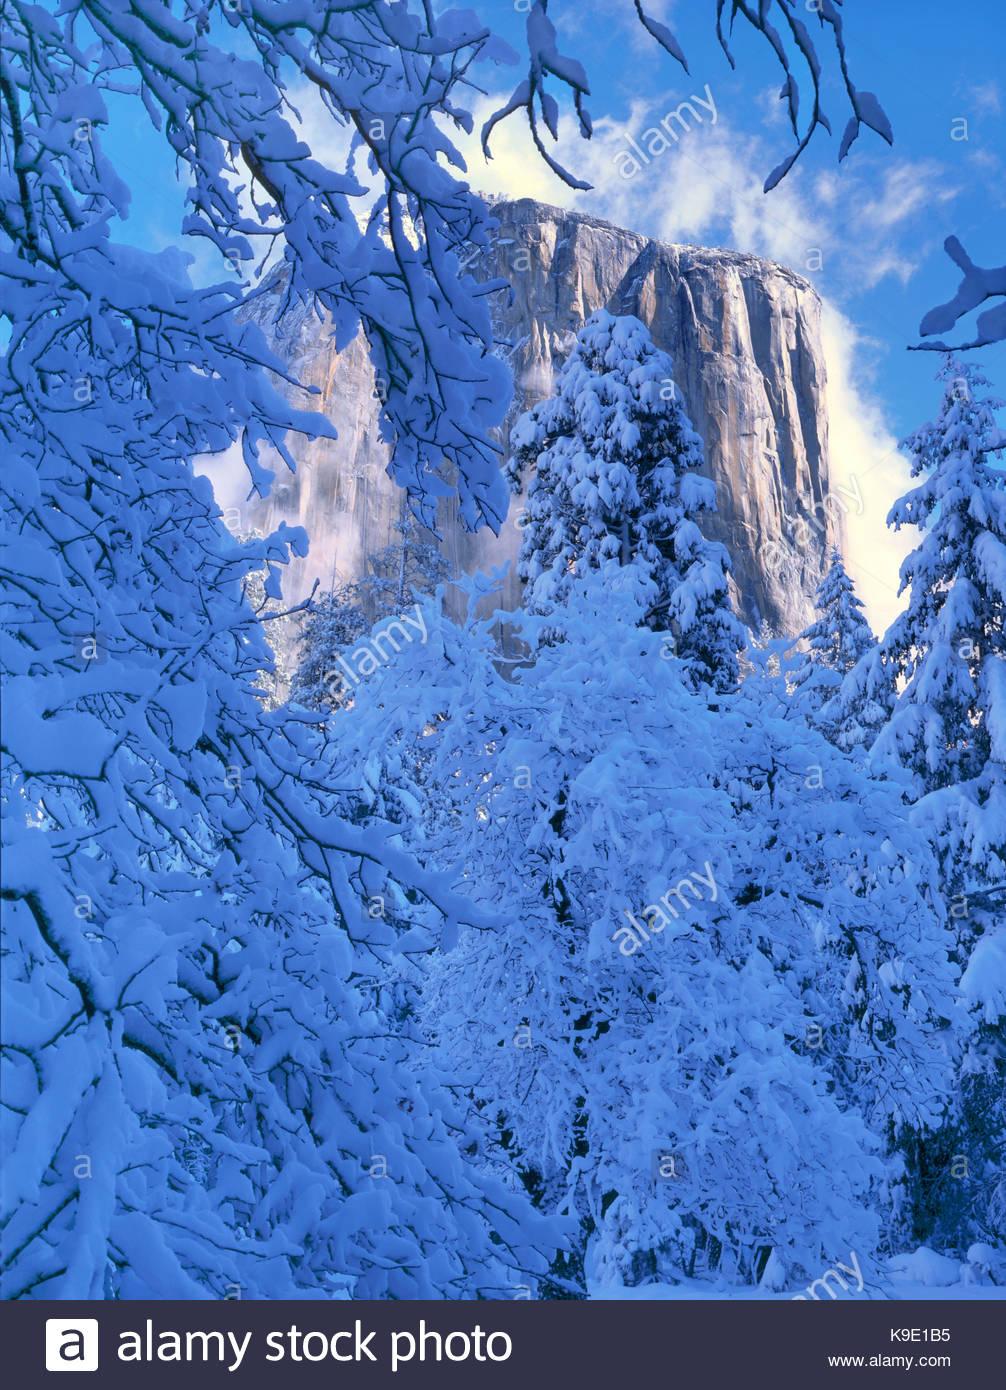 Nach dem Schneesturm El Capitan, Yosemite National Park, Kalifornien Stockbild